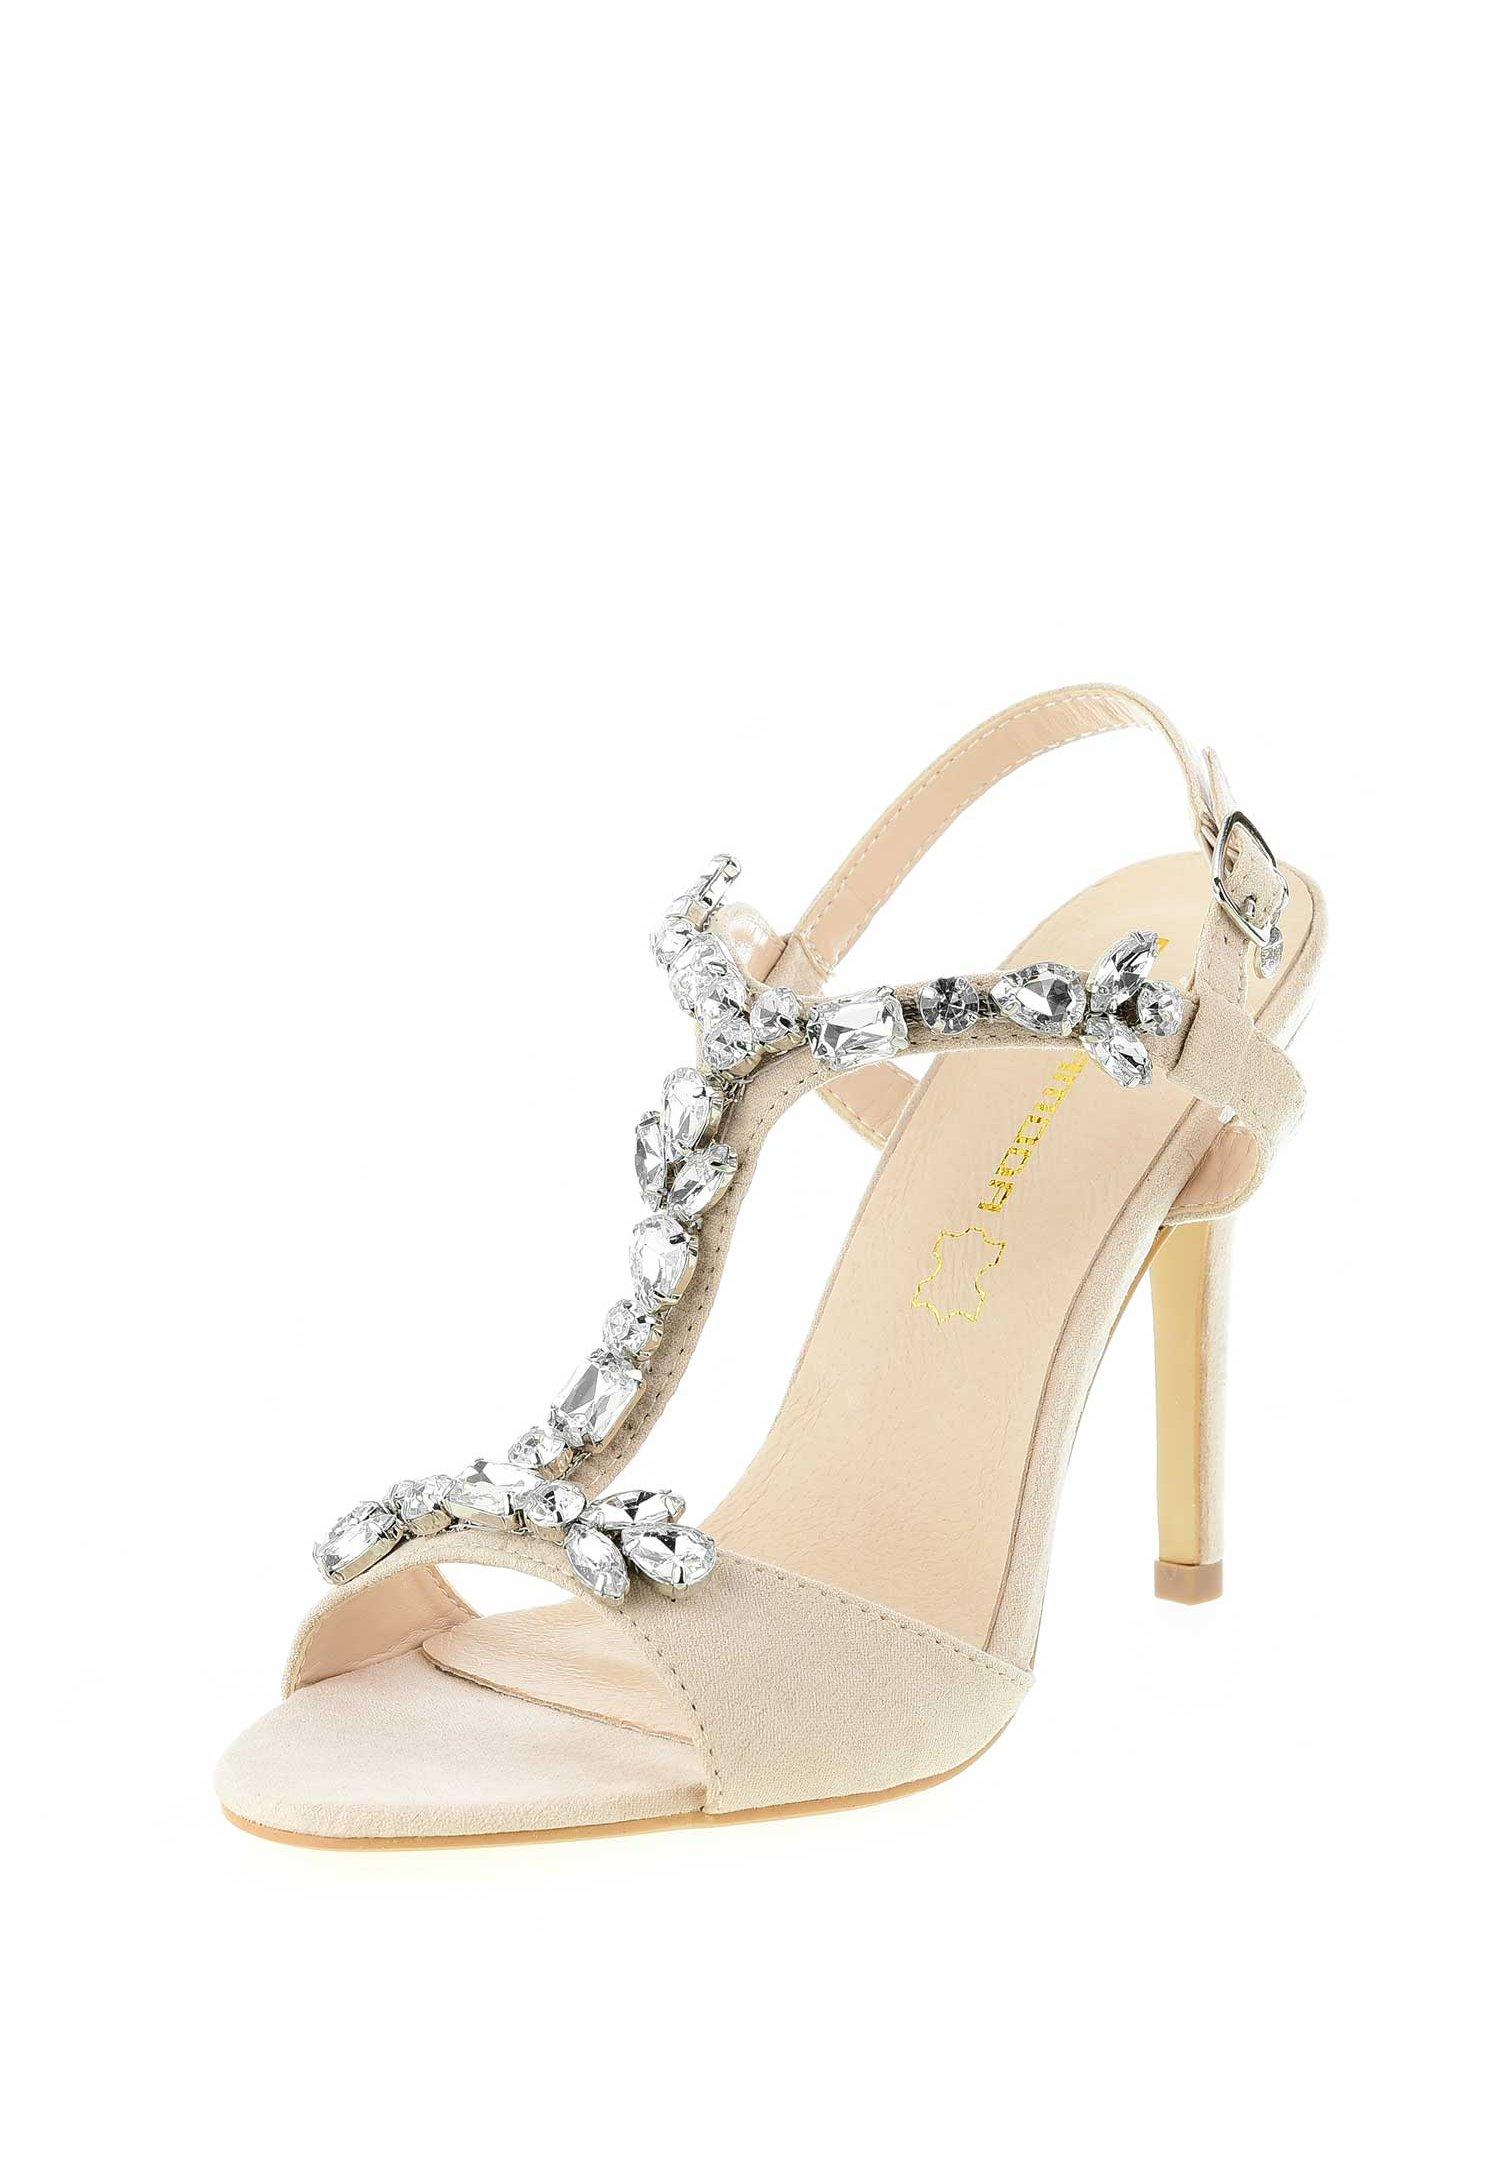 PRIMA MODA VAGLIODI High Heel Sandalette beige/sand